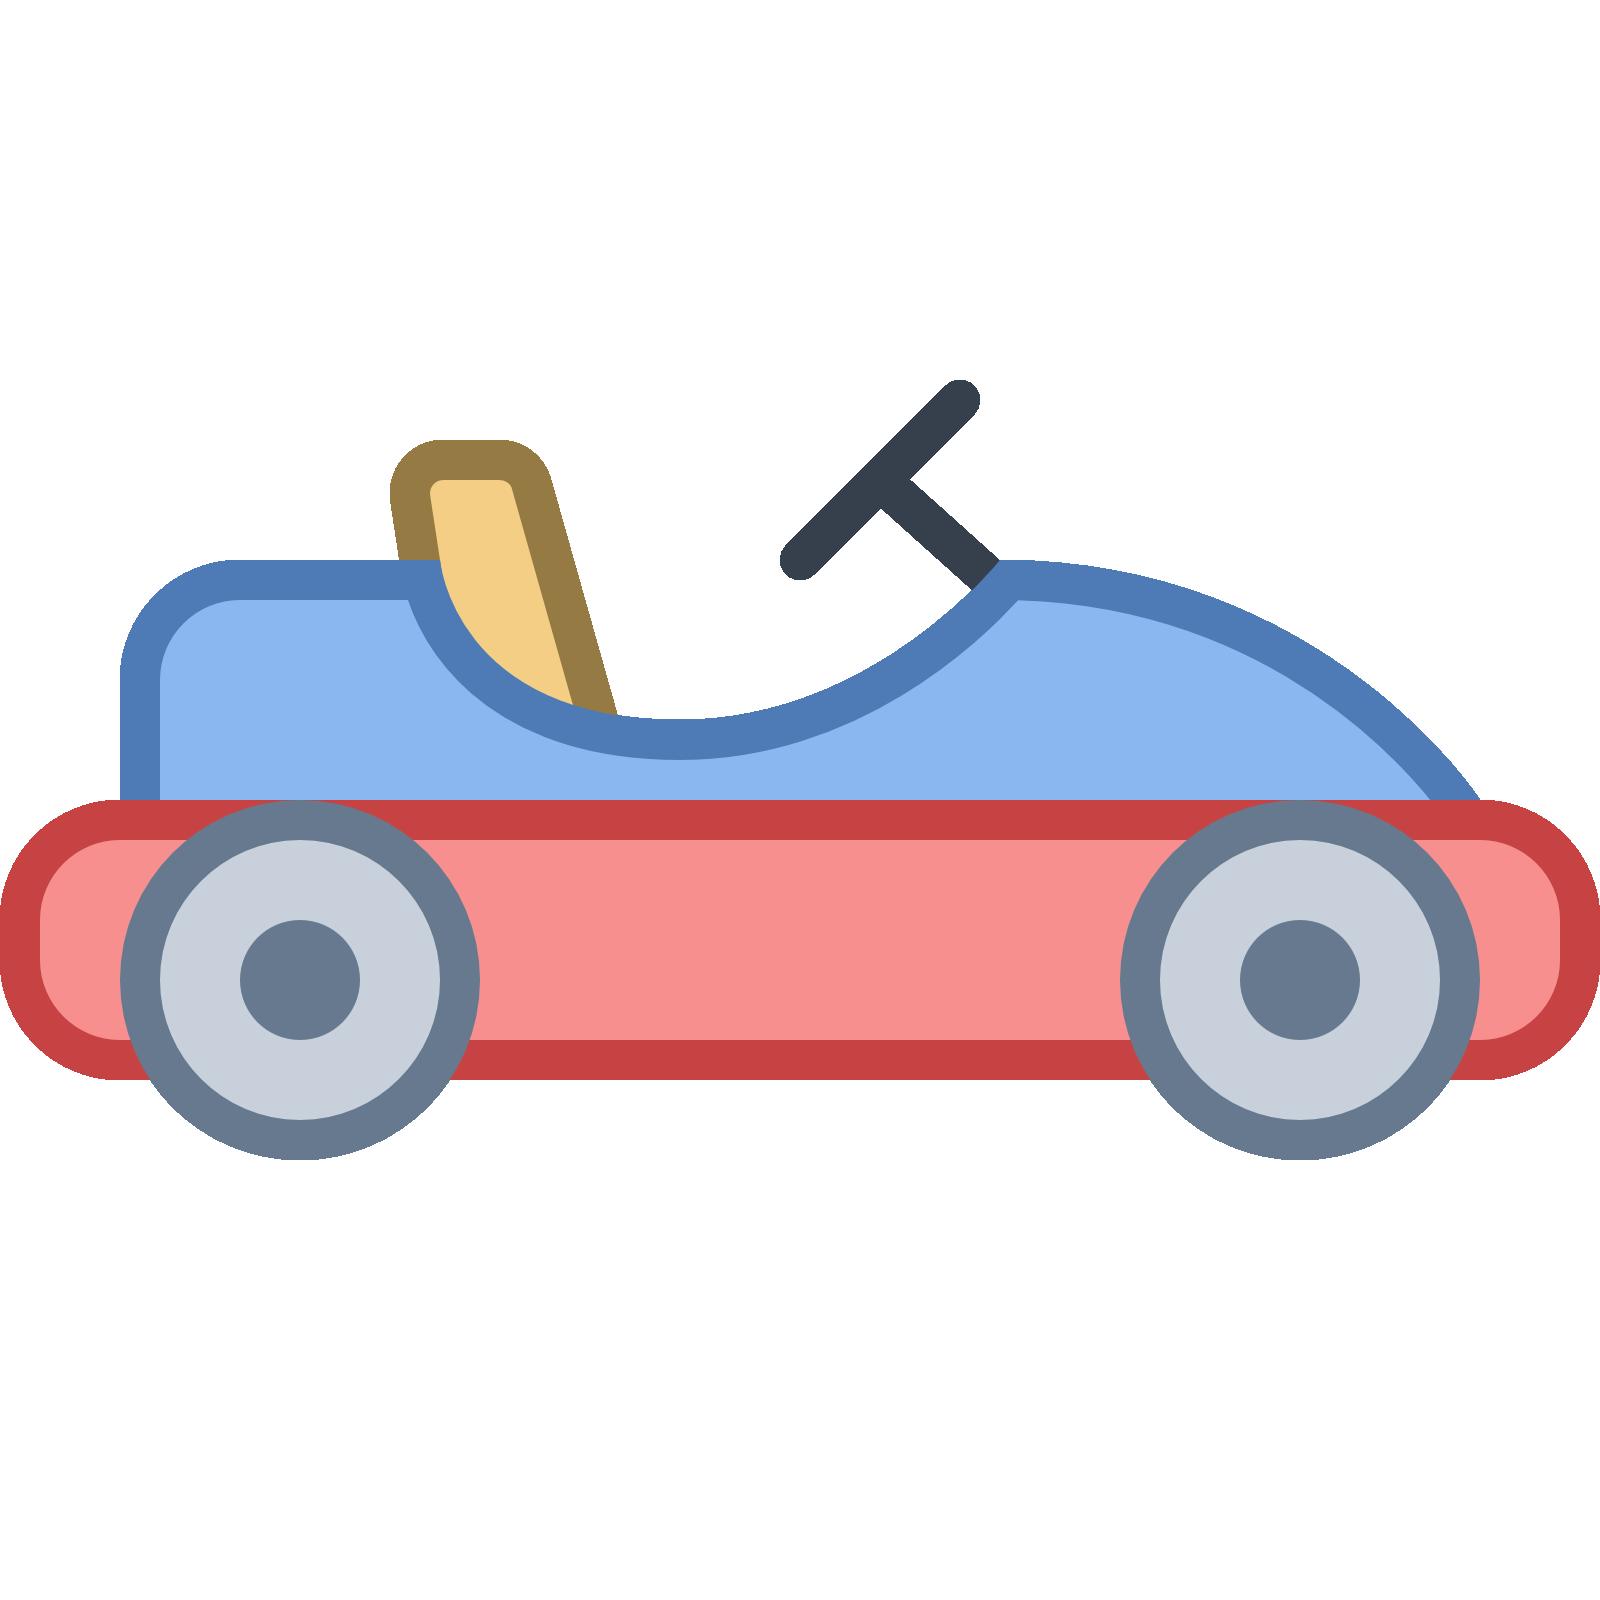 1600x1600 Car Crash Icon Png Clipart